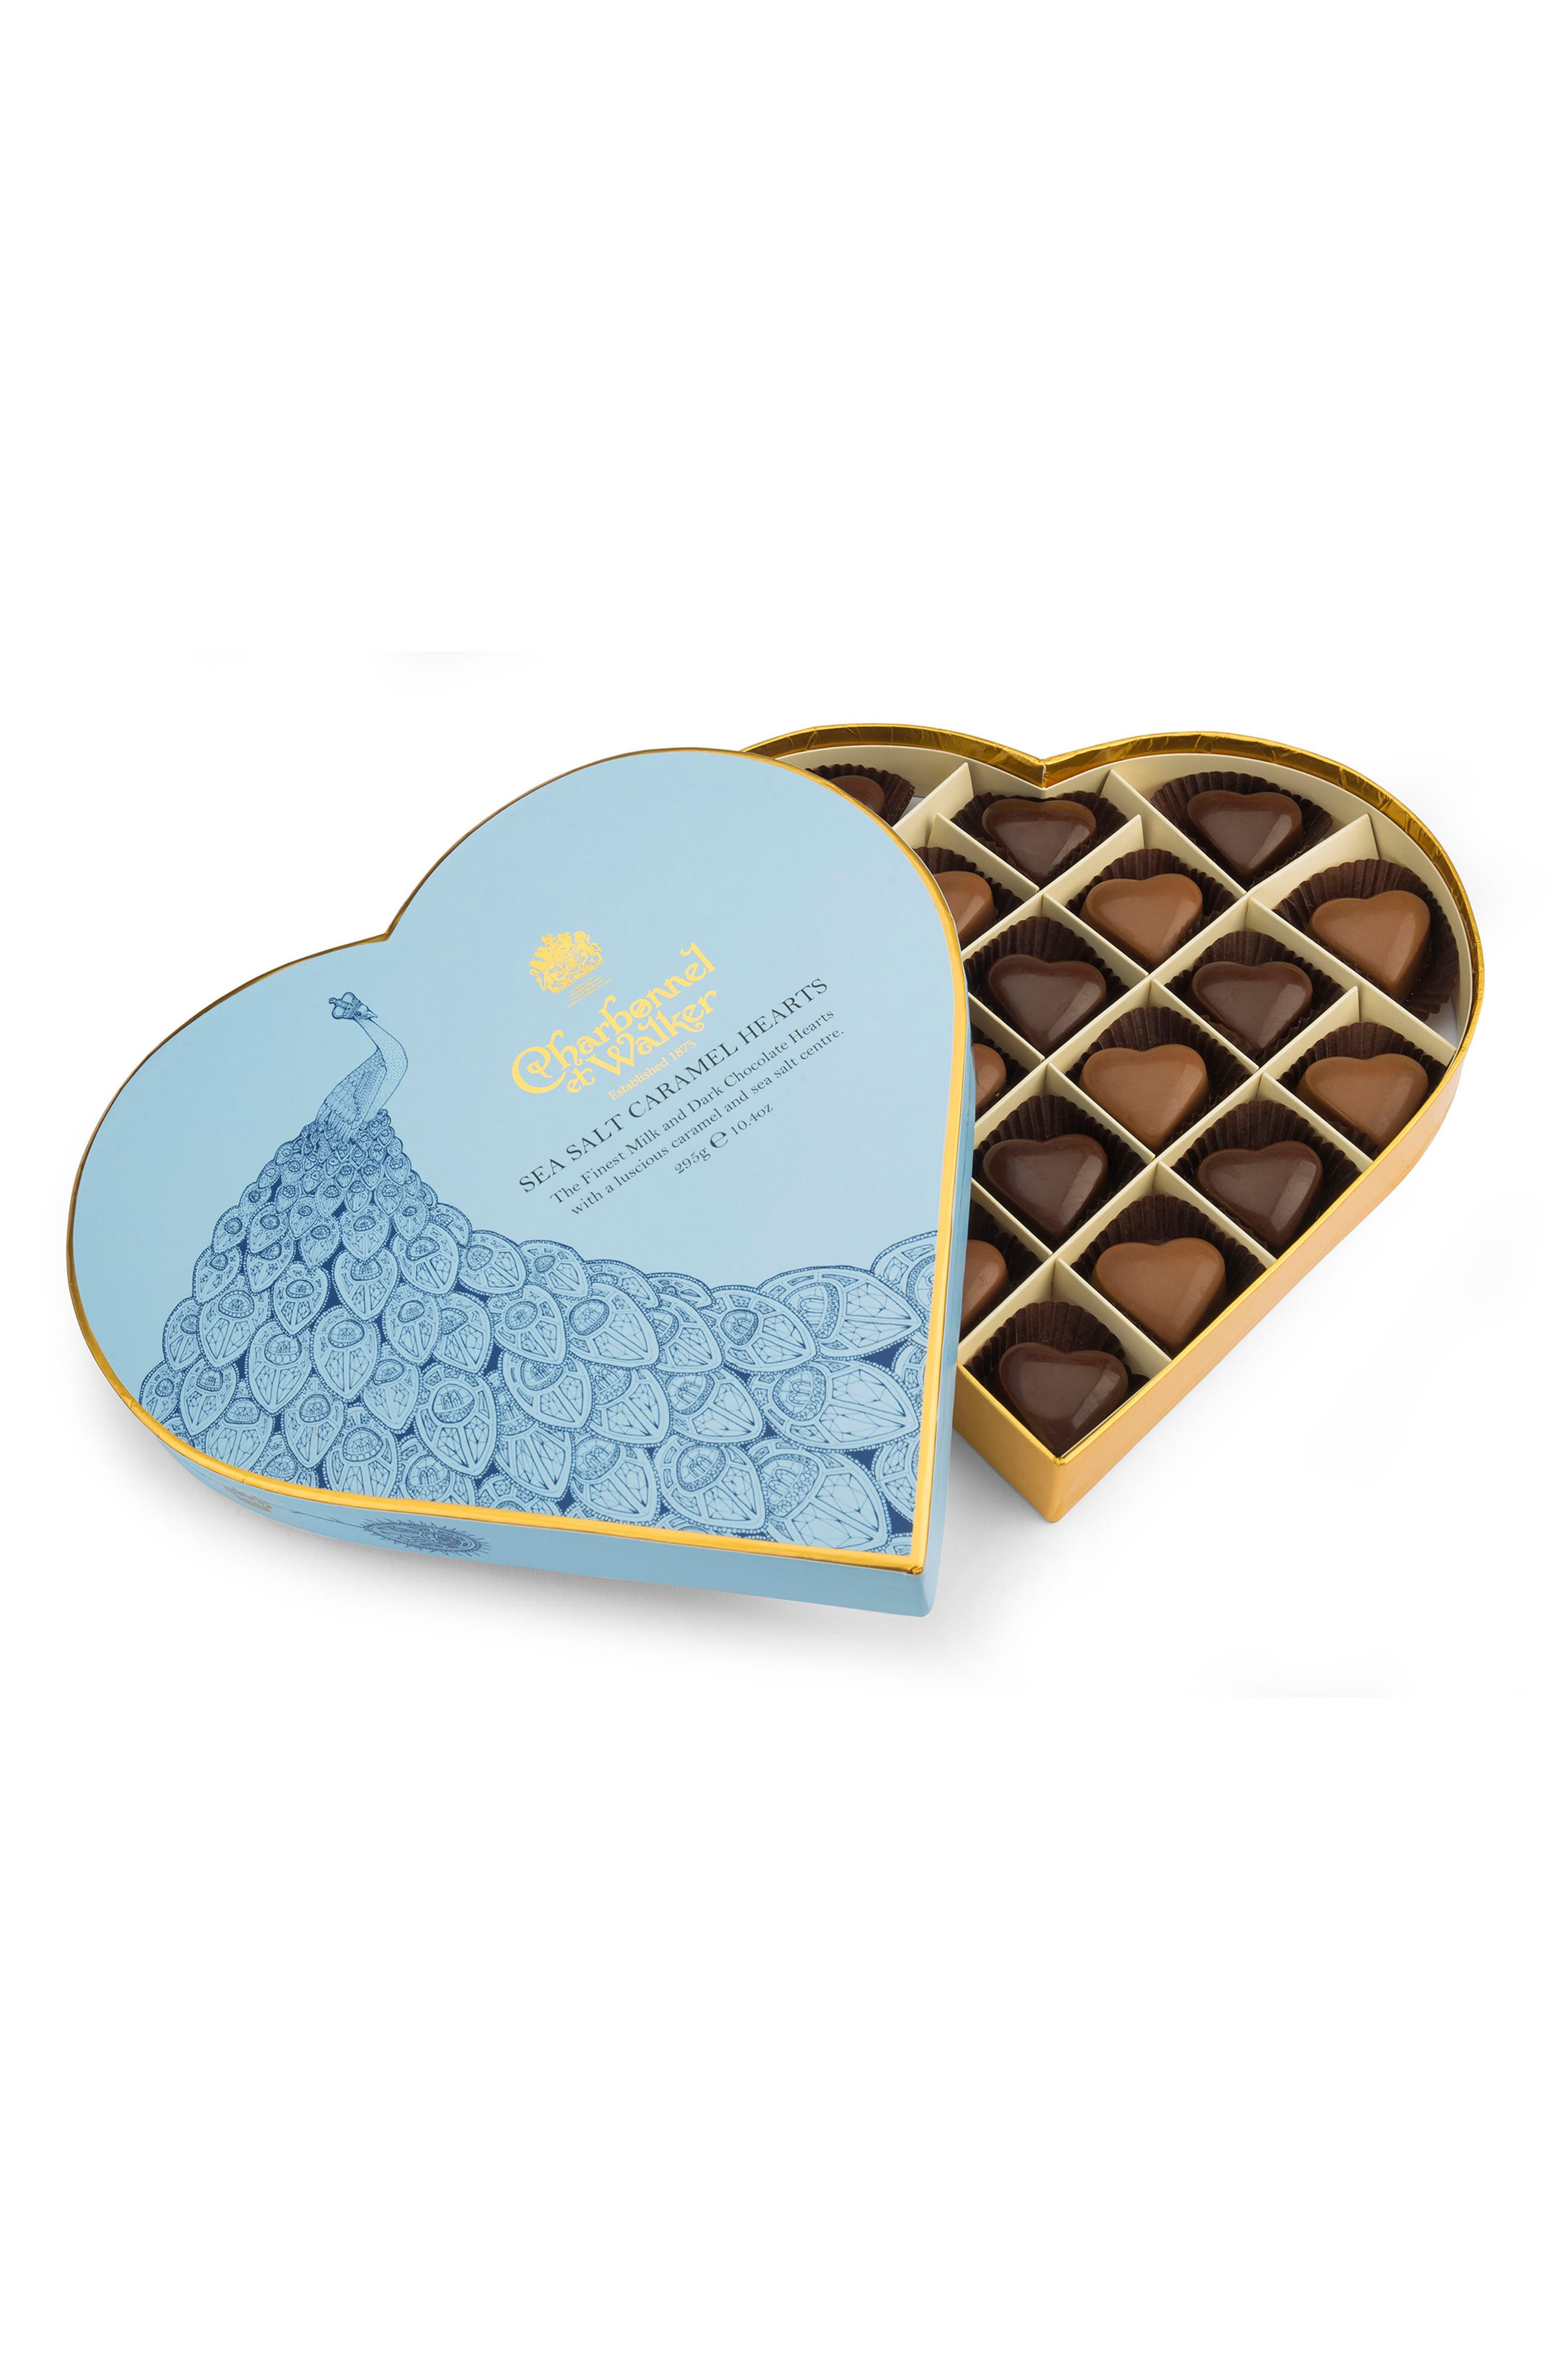 Main Image - Charbonnel et Walker Sea Salt Caramel Chocolates in Heart Shaped Gift Box